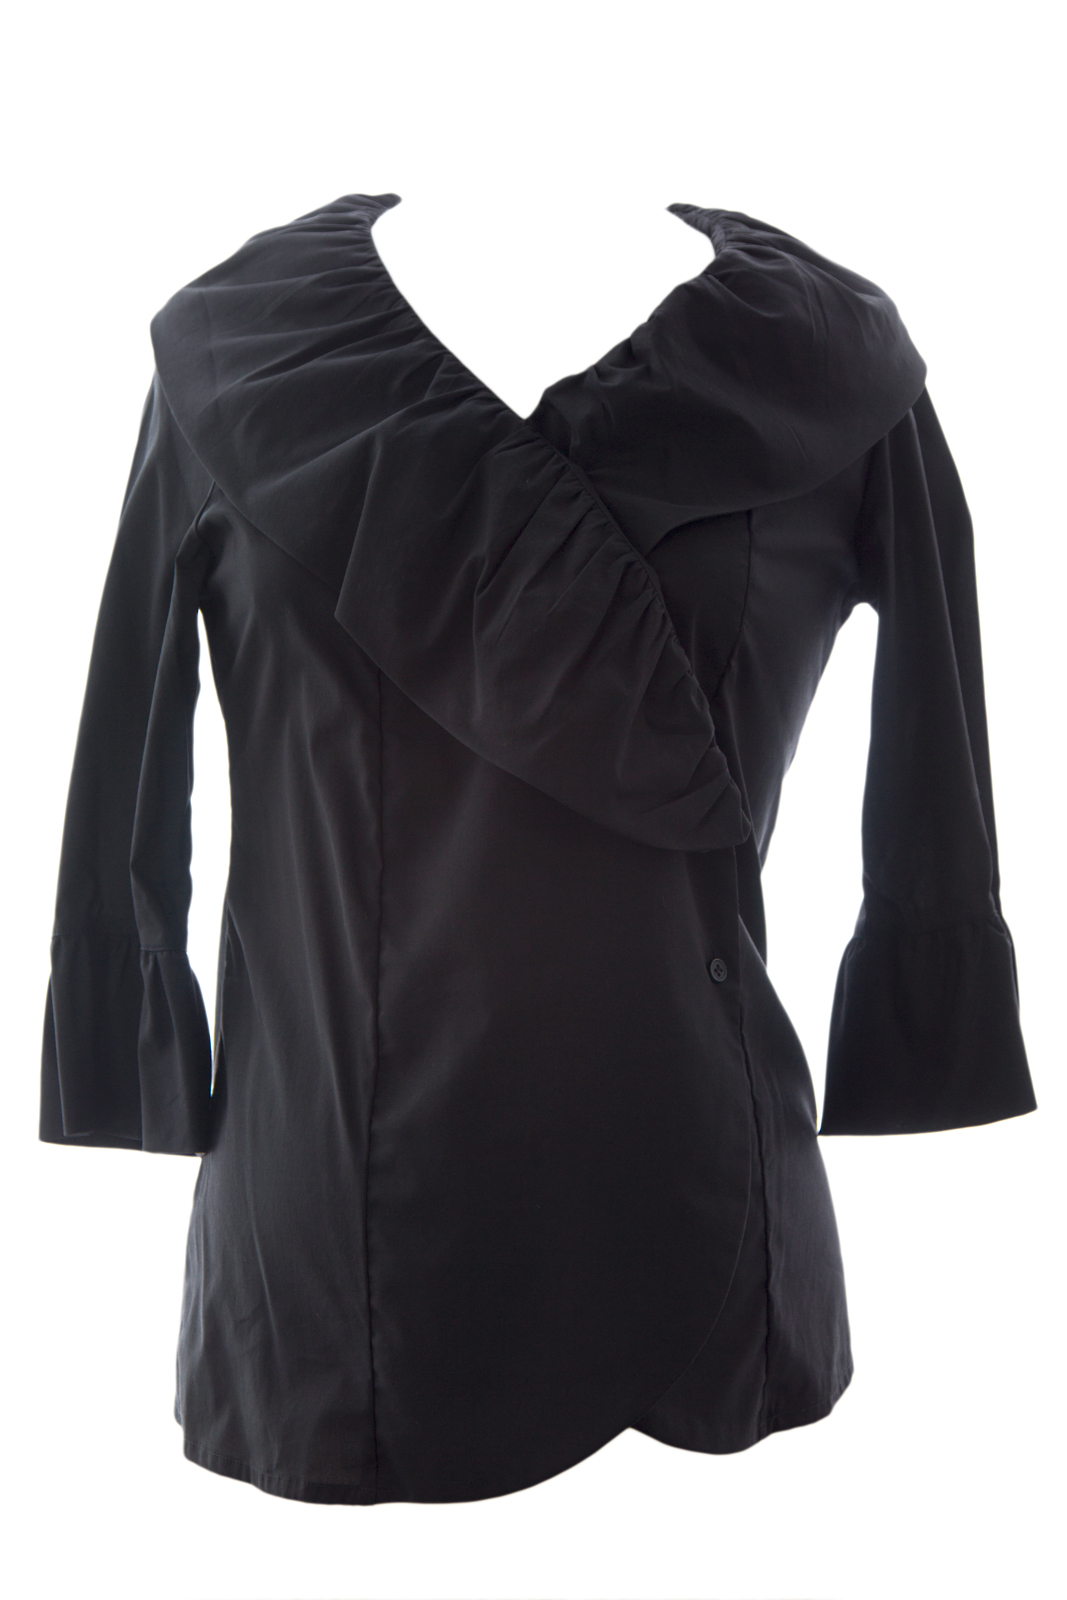 OLIAN Maternity Women's Ruffled Front 3/4 Sleeve Wrap Top